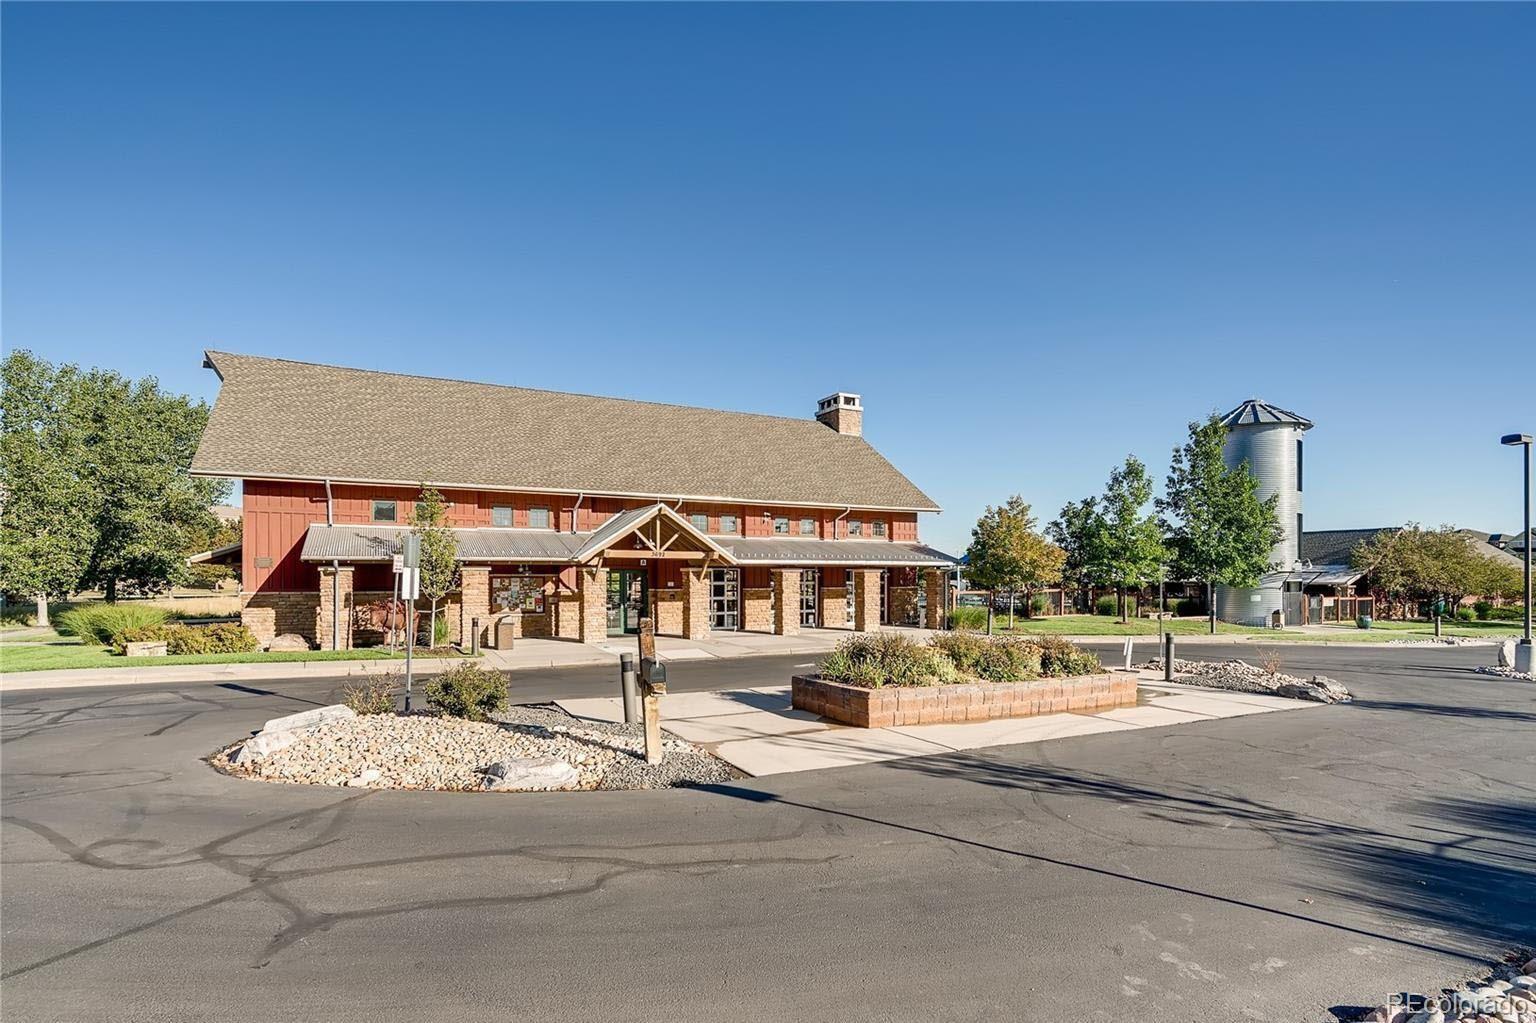 MLS# 4377973 - 20 - 2895 Black Canyon Way, Castle Rock, CO 80109